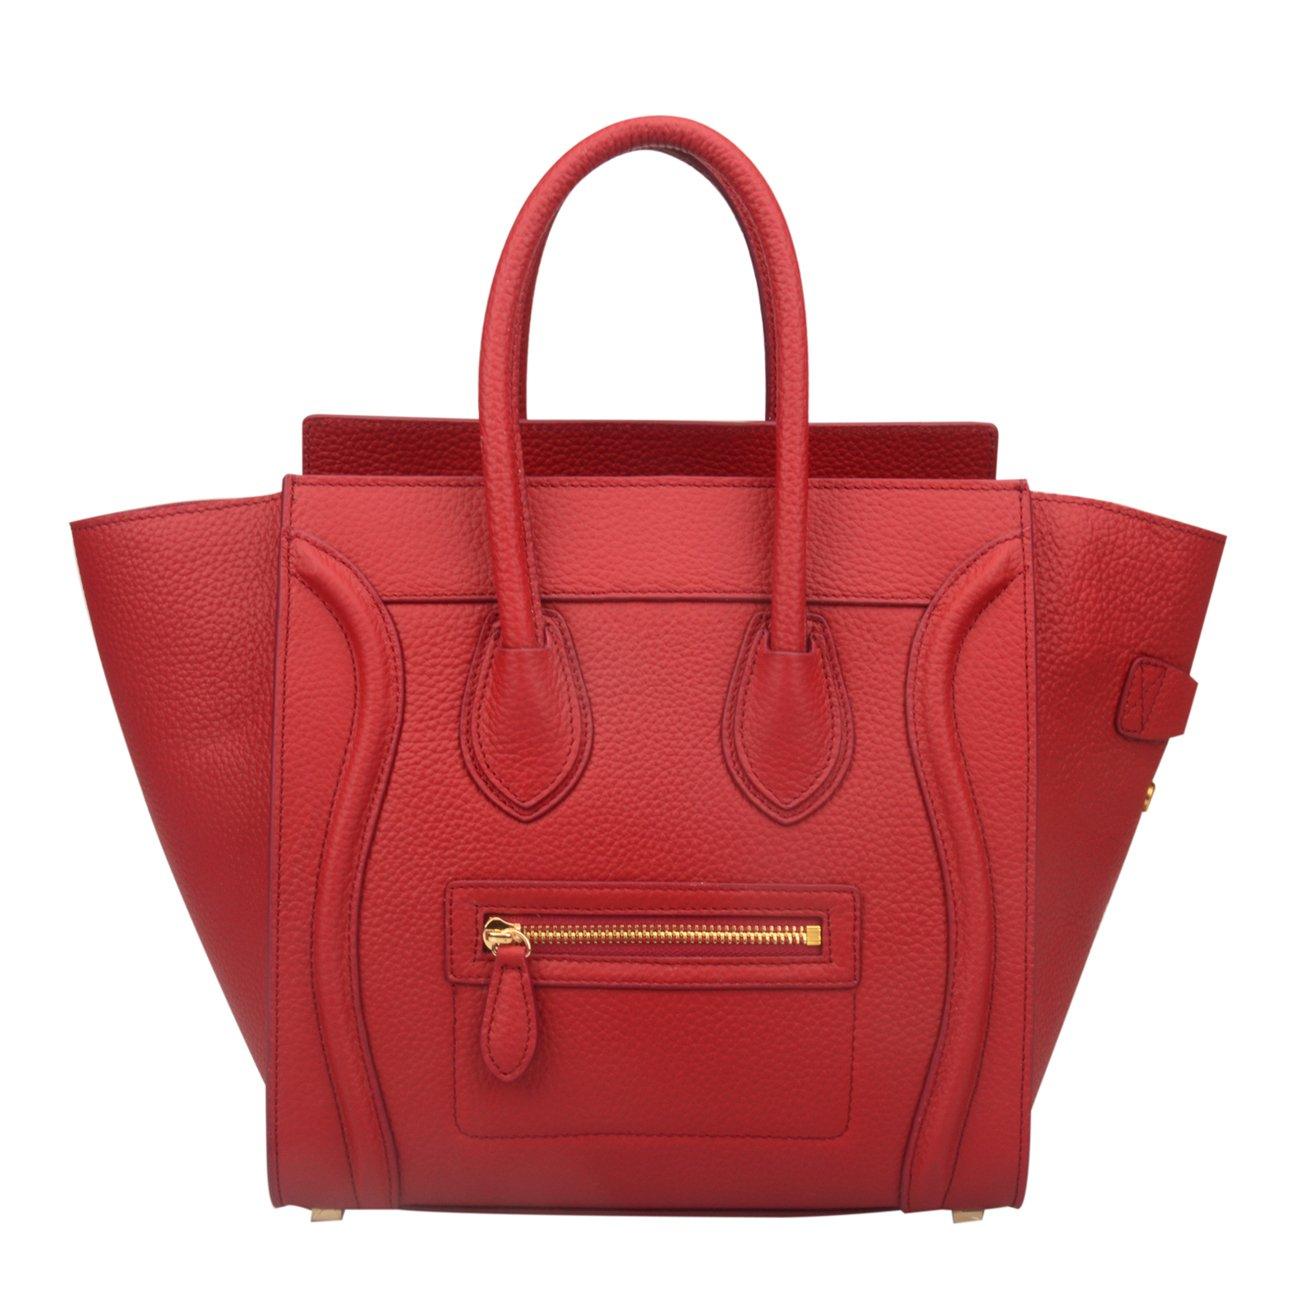 Ainifeel Women's Genuine Leather Smile Top Handle Handbag Purse (Medium, Claret)